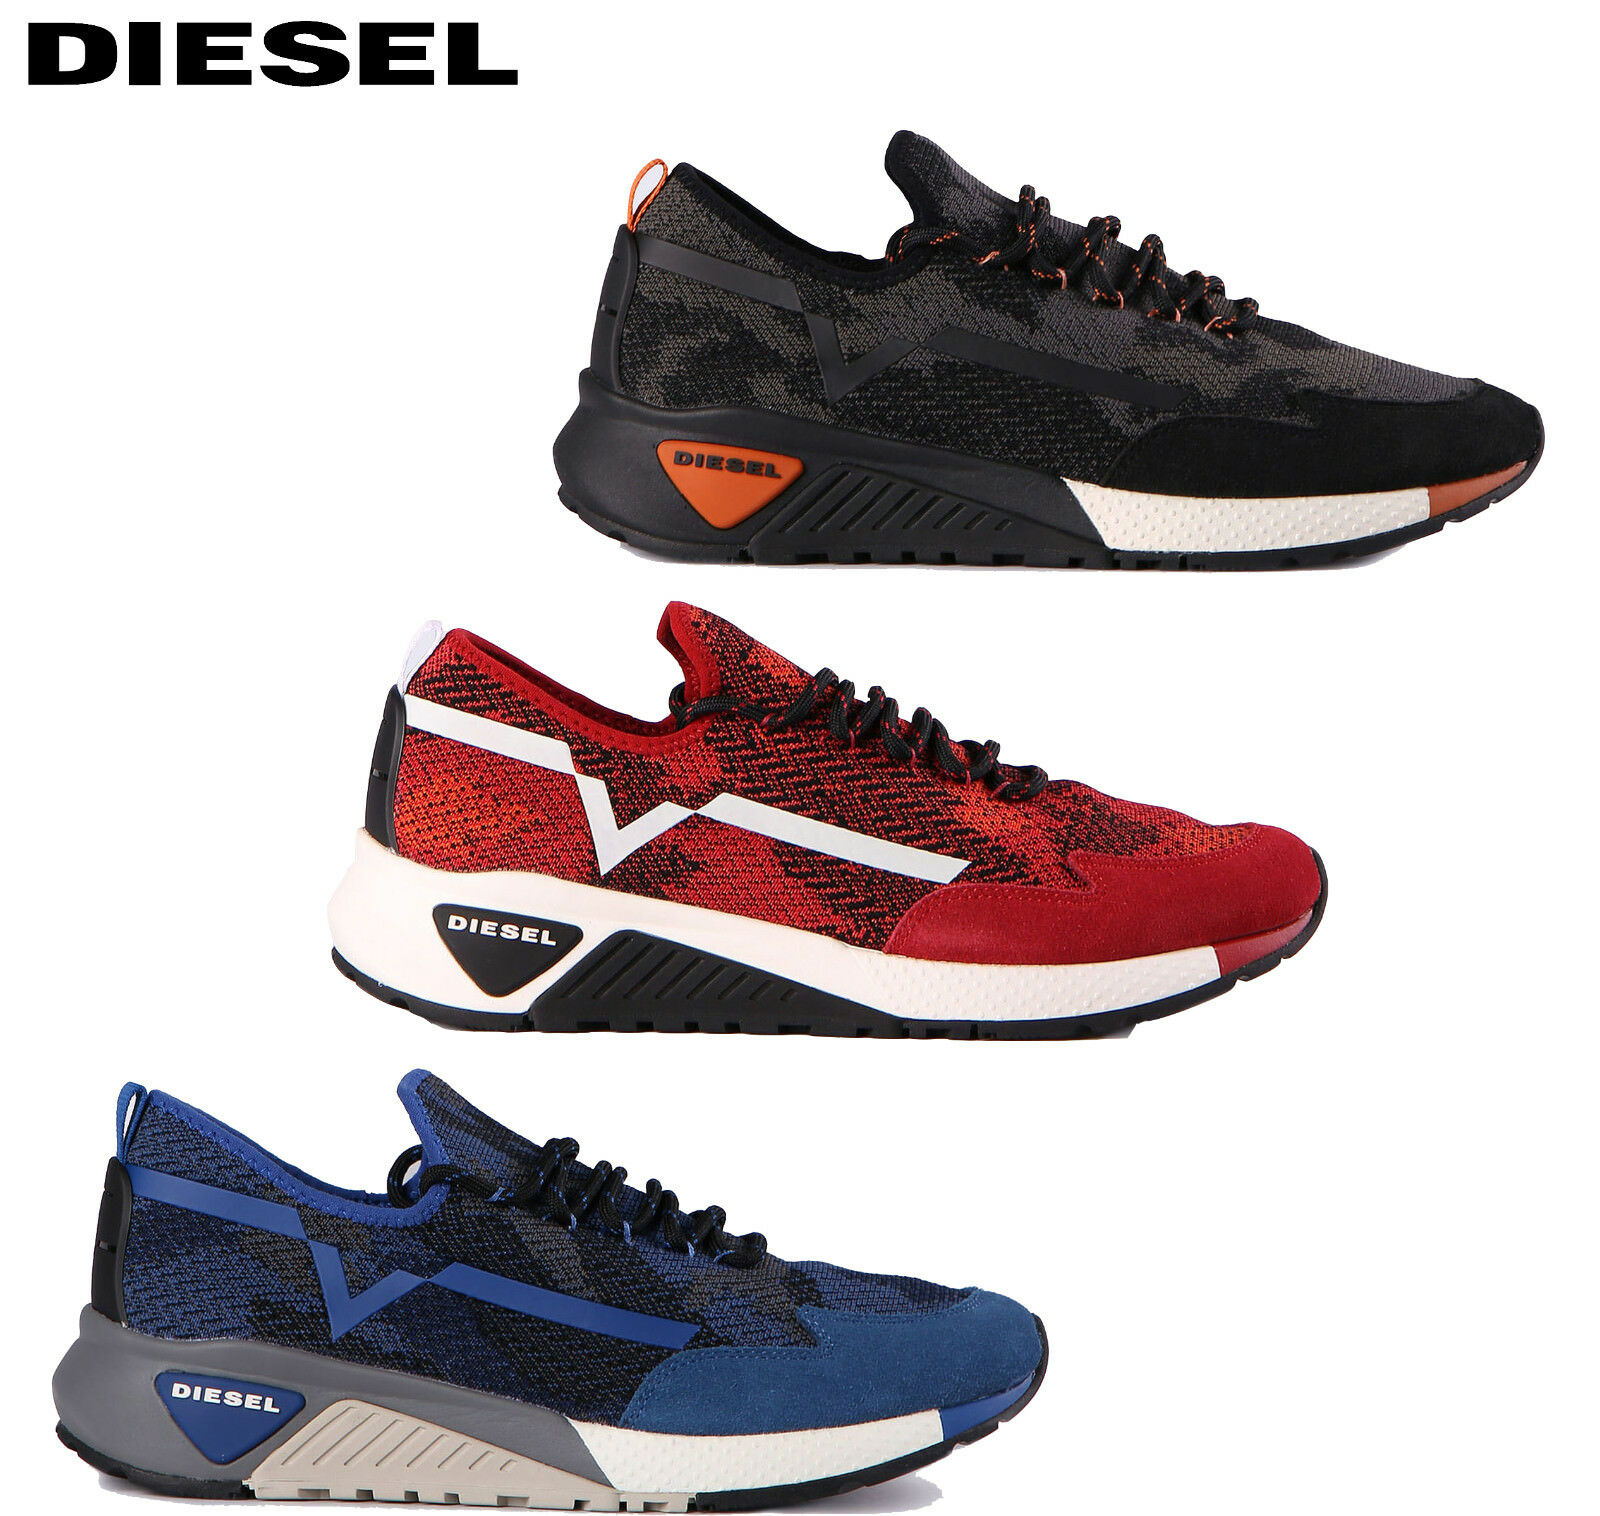 Scarpe casual da uomo  uomo Diesel Shoes SKB Knit Runner Diesel S-KBY Trainers Y01534 P1349 NEW